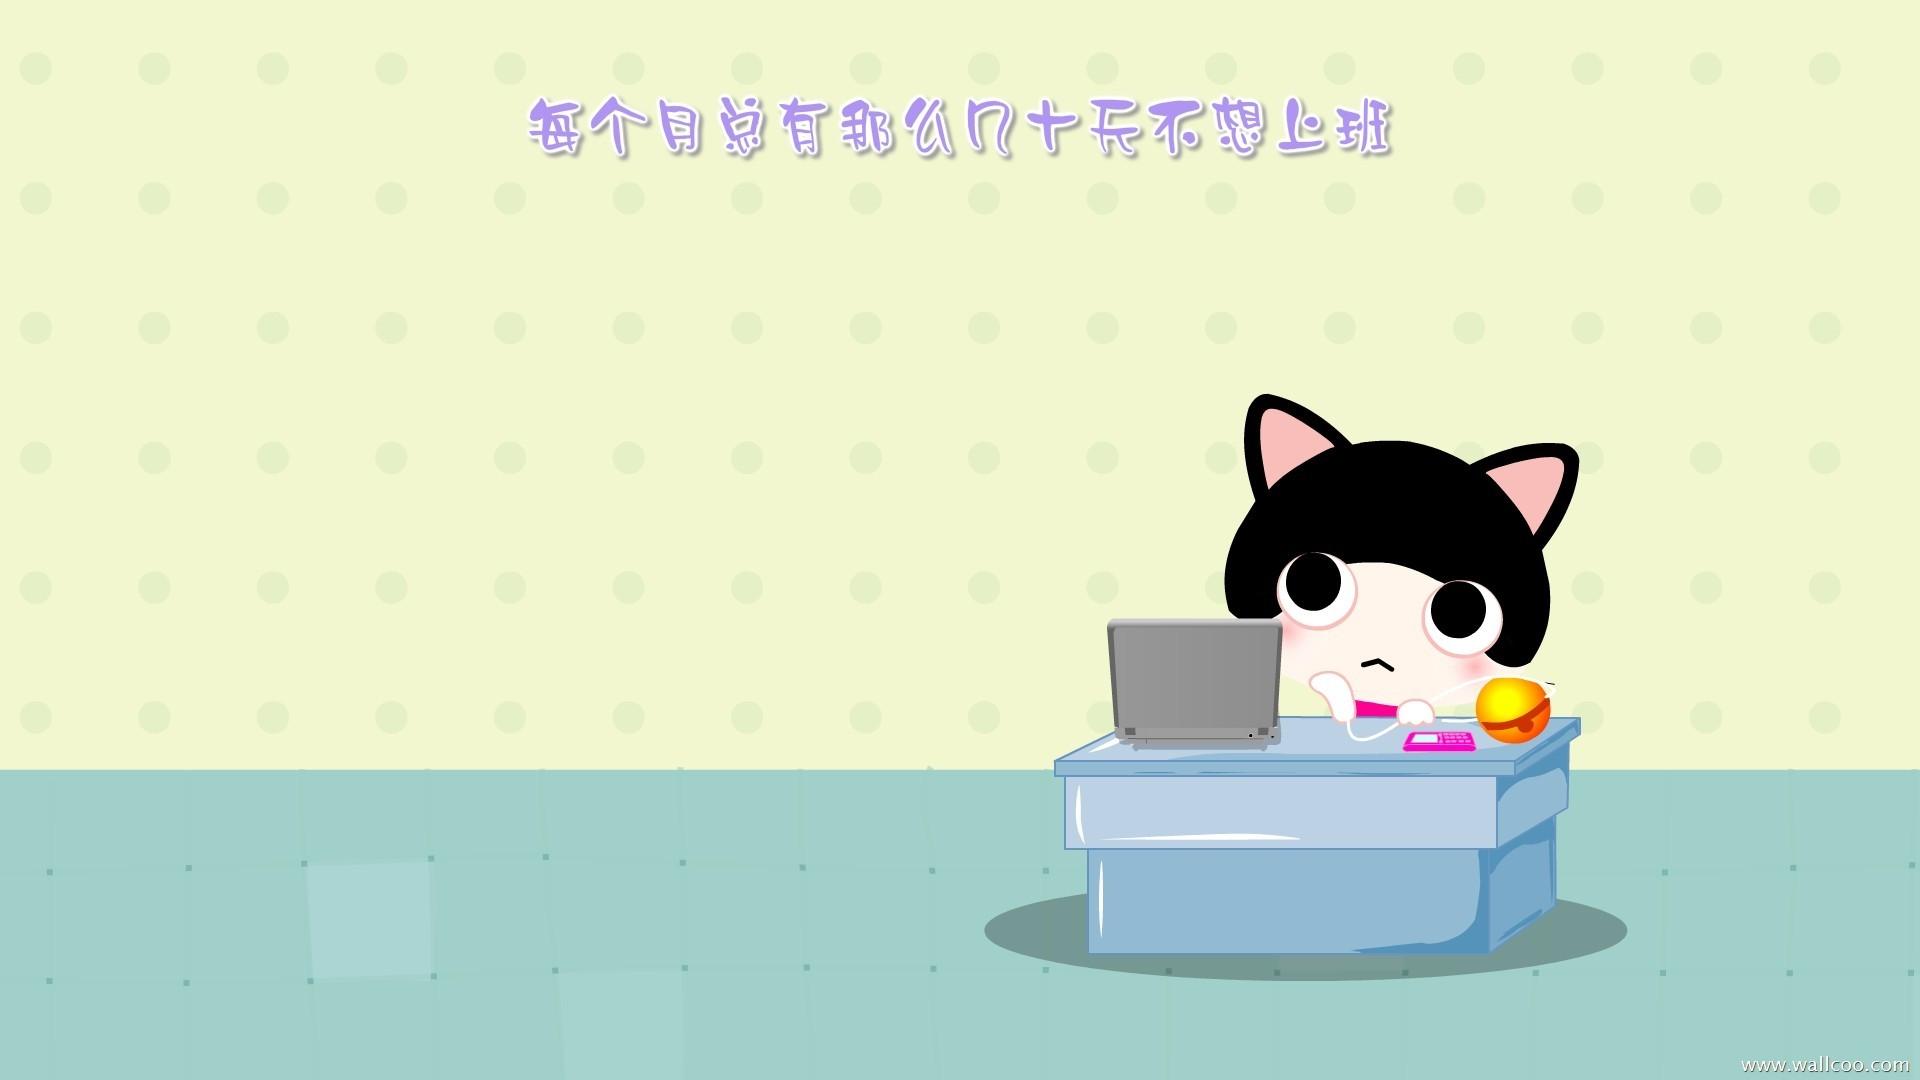 Cute Cartoon Cat Wallpaper 71 Images